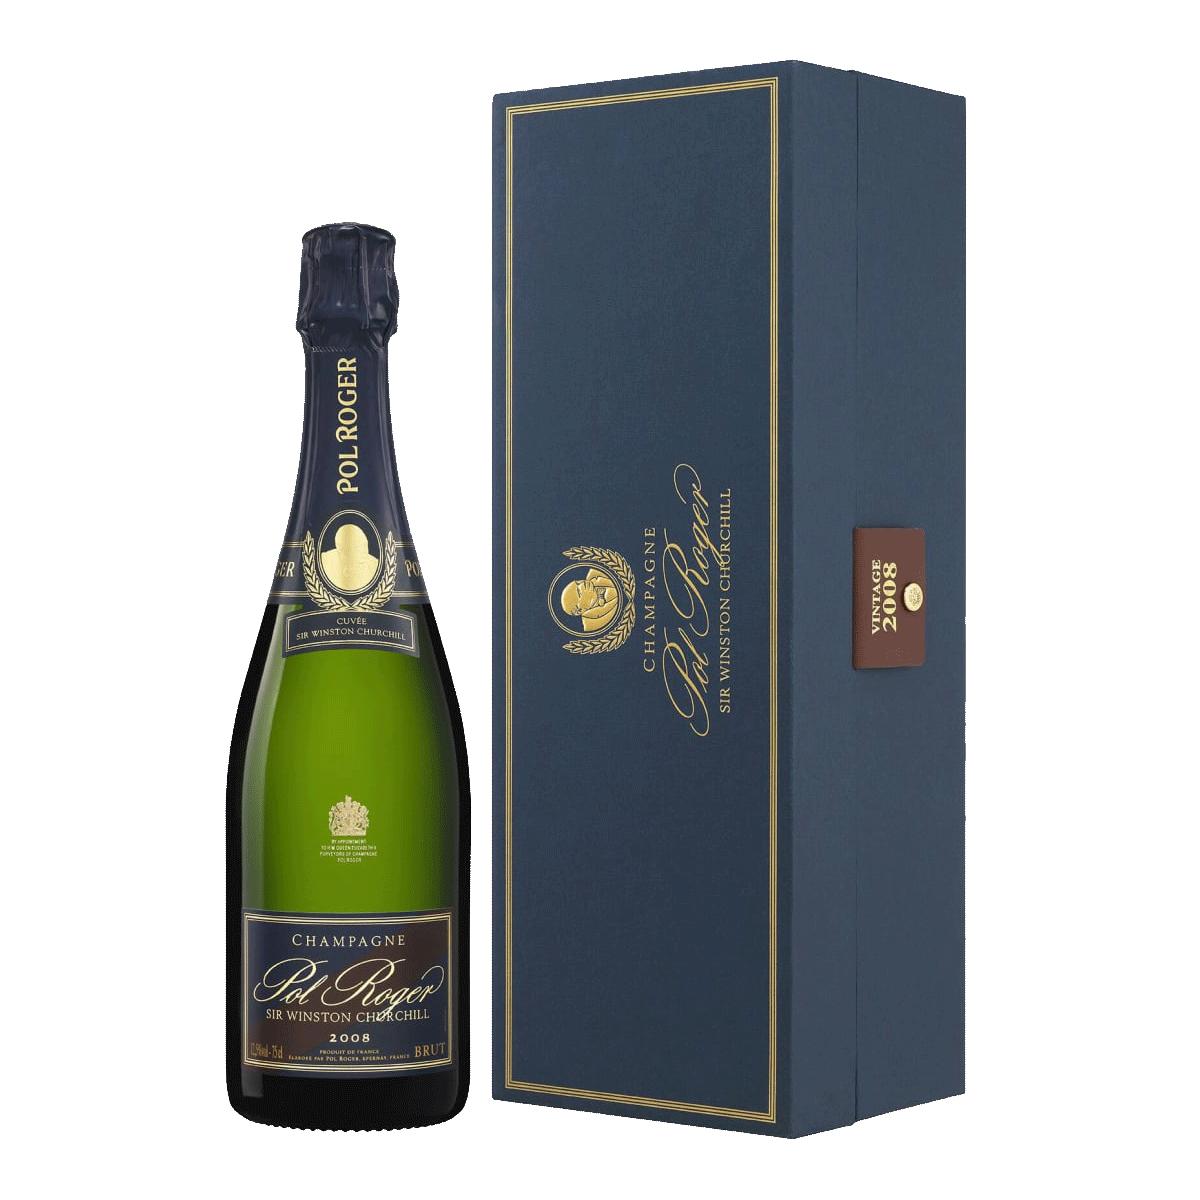 Sparkling Pol Roger Champagne Brut Sir Winston Churchill Gift Box 2008